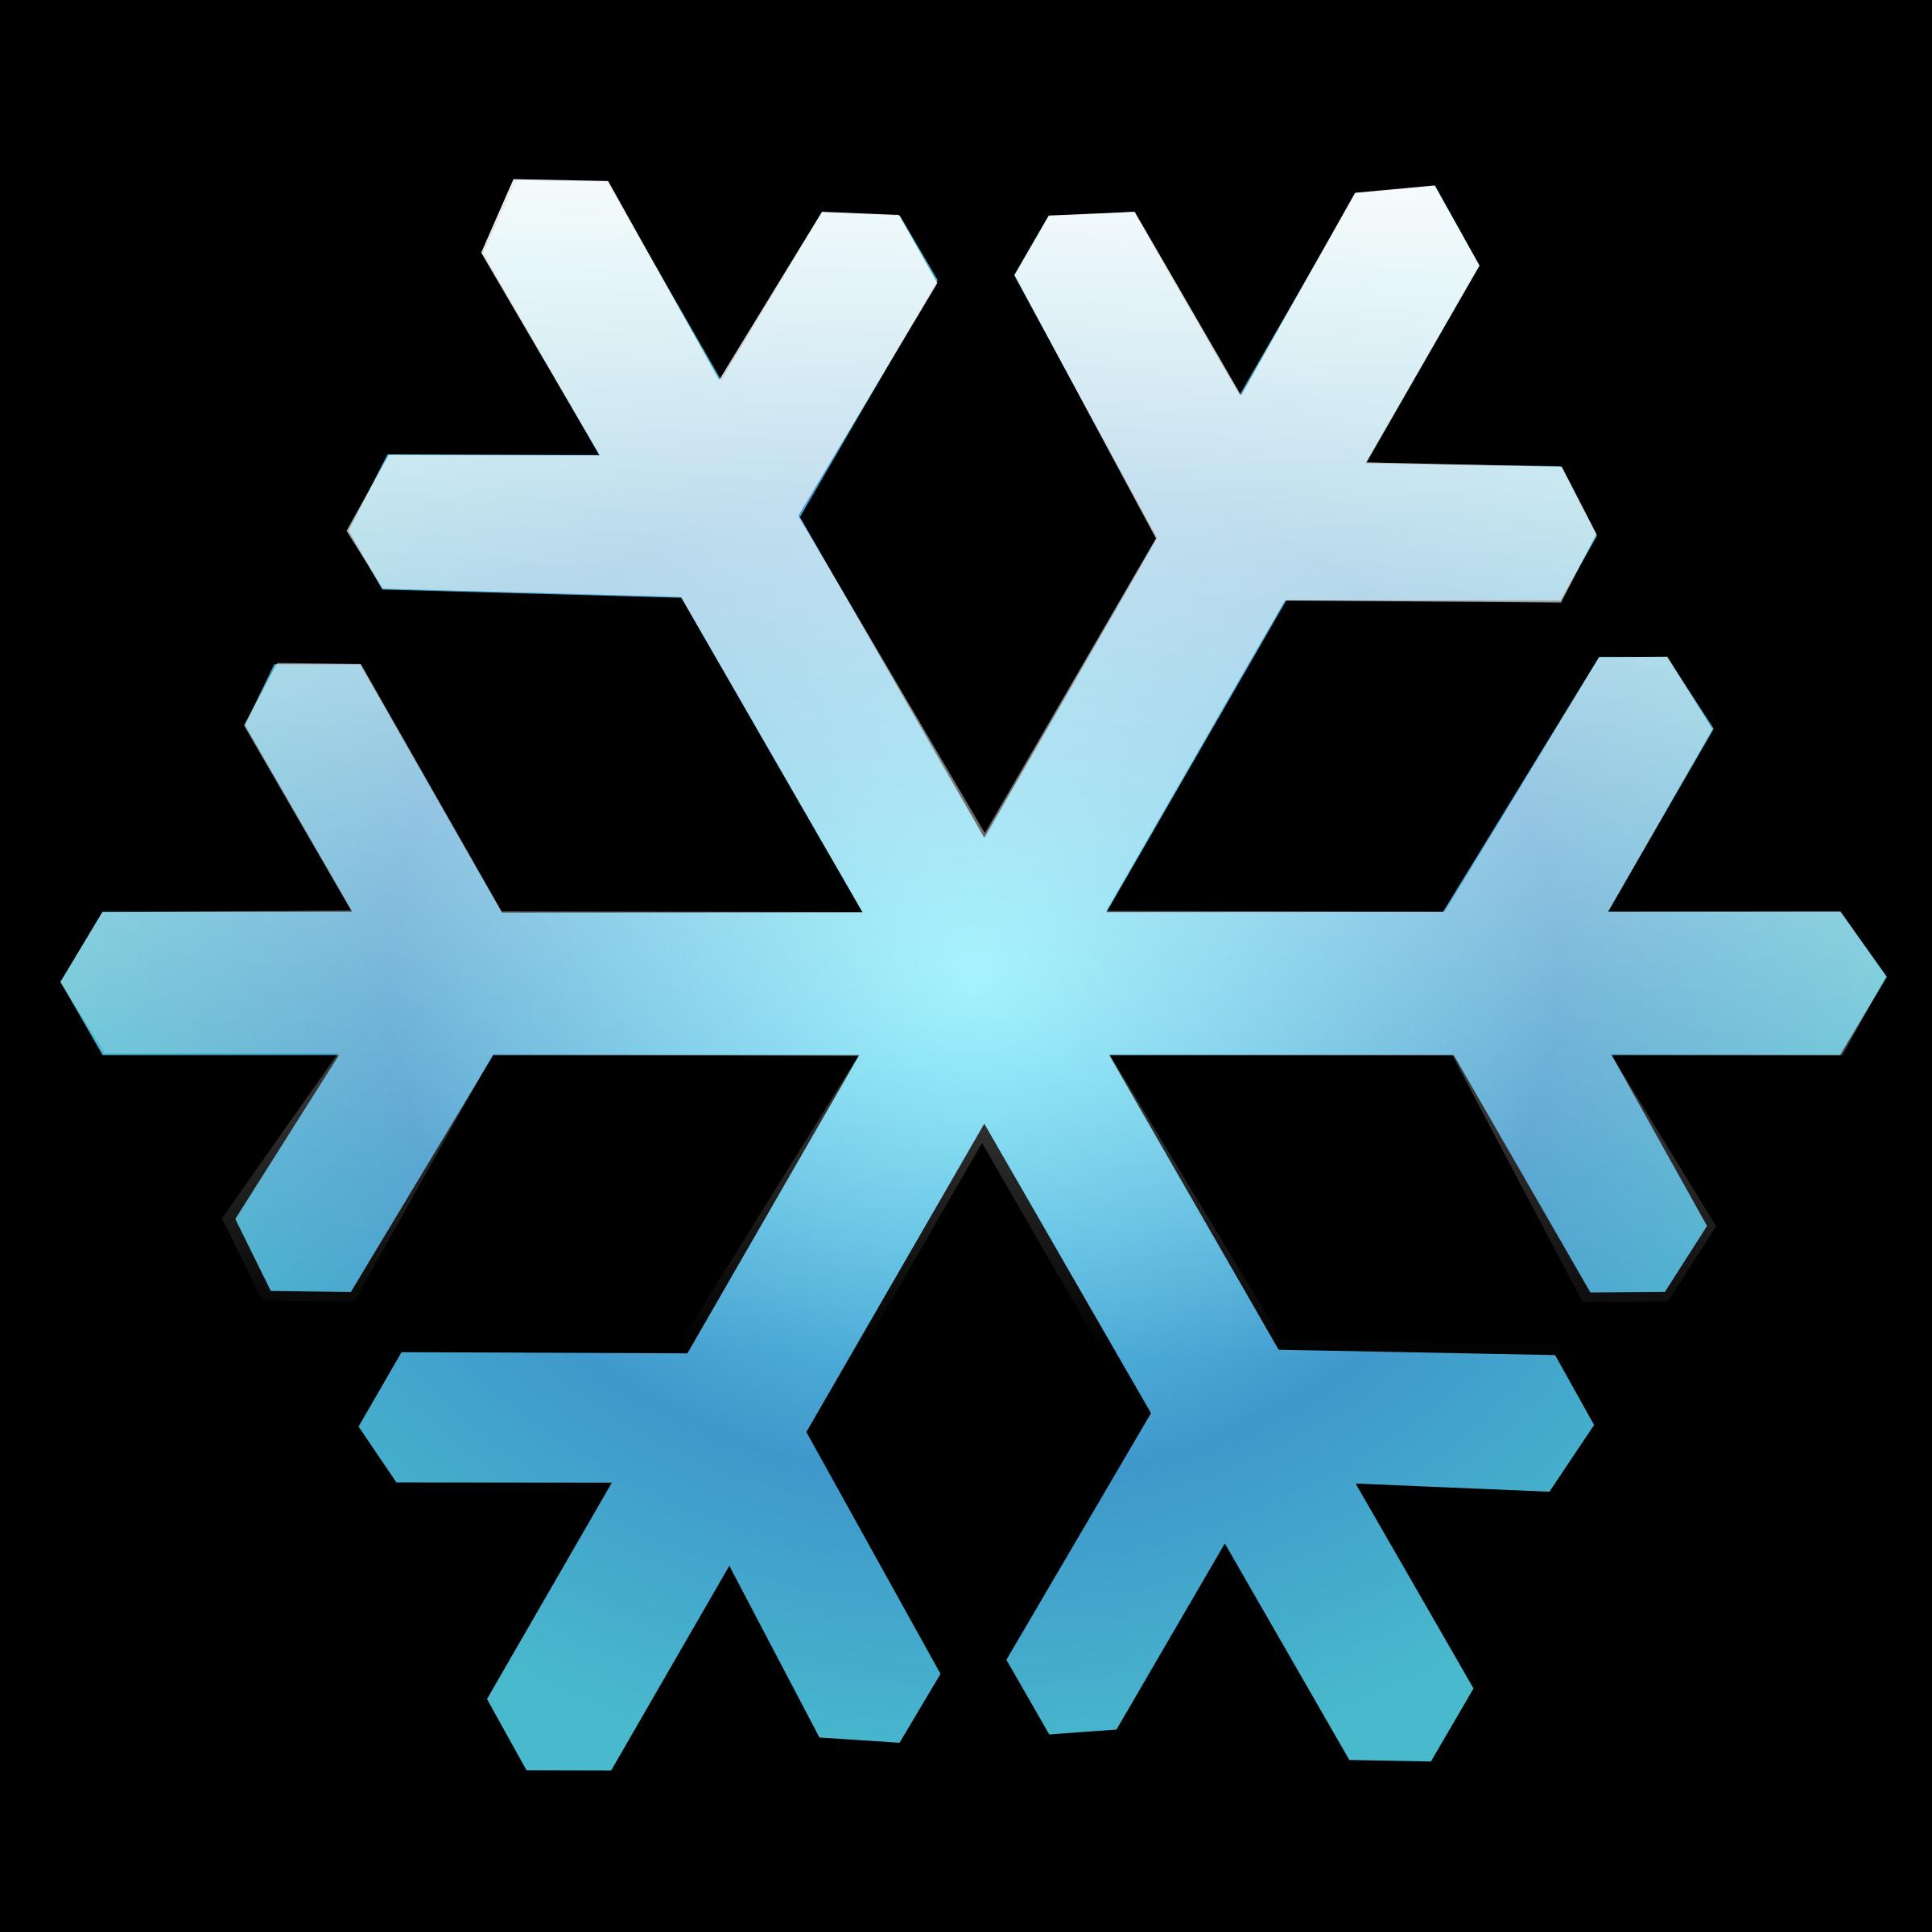 2400x2400 Snow Snowflake Clipart, Explore Pictures